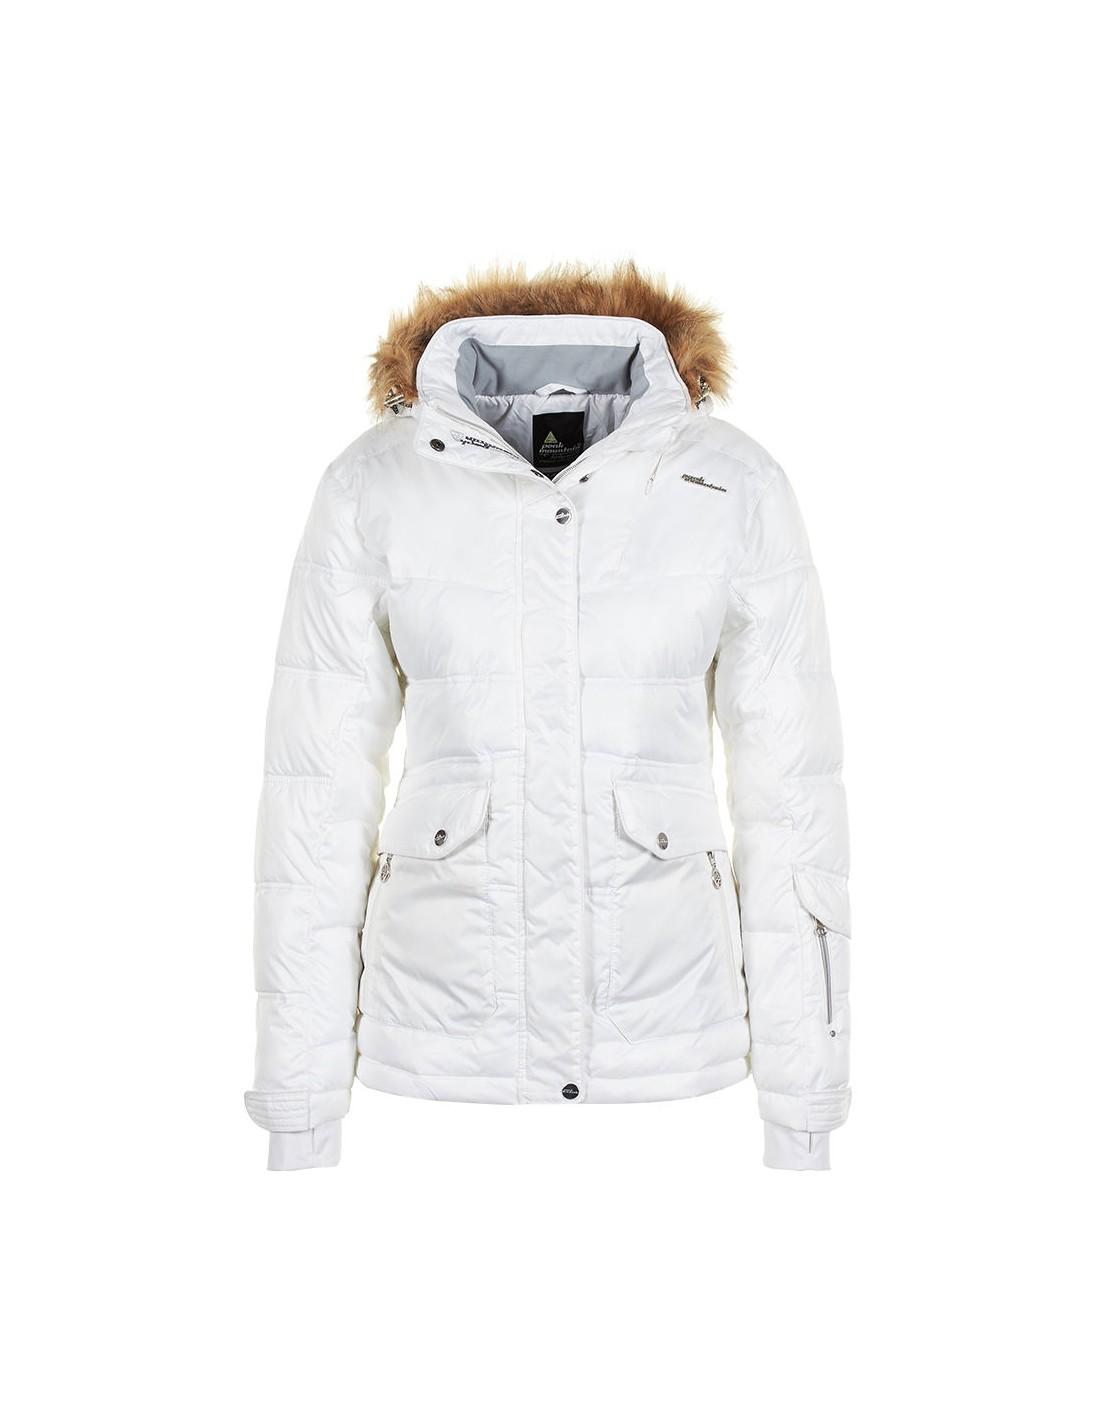 a235bf038d43 doudoune-skiwear-femme-alesa-peak-mountain